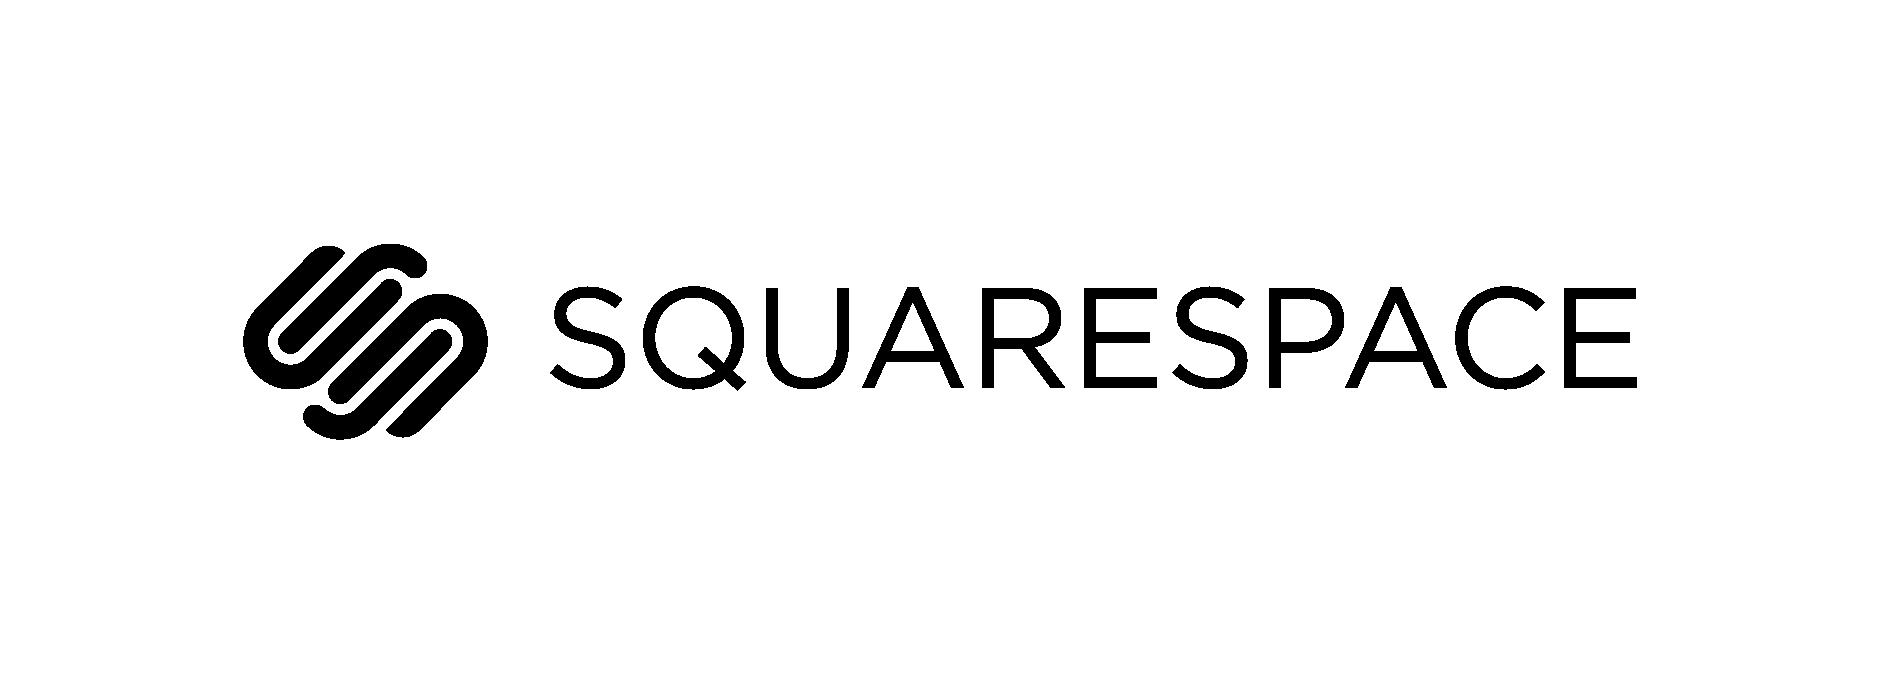 2015-05-11-squarespace-logo.png